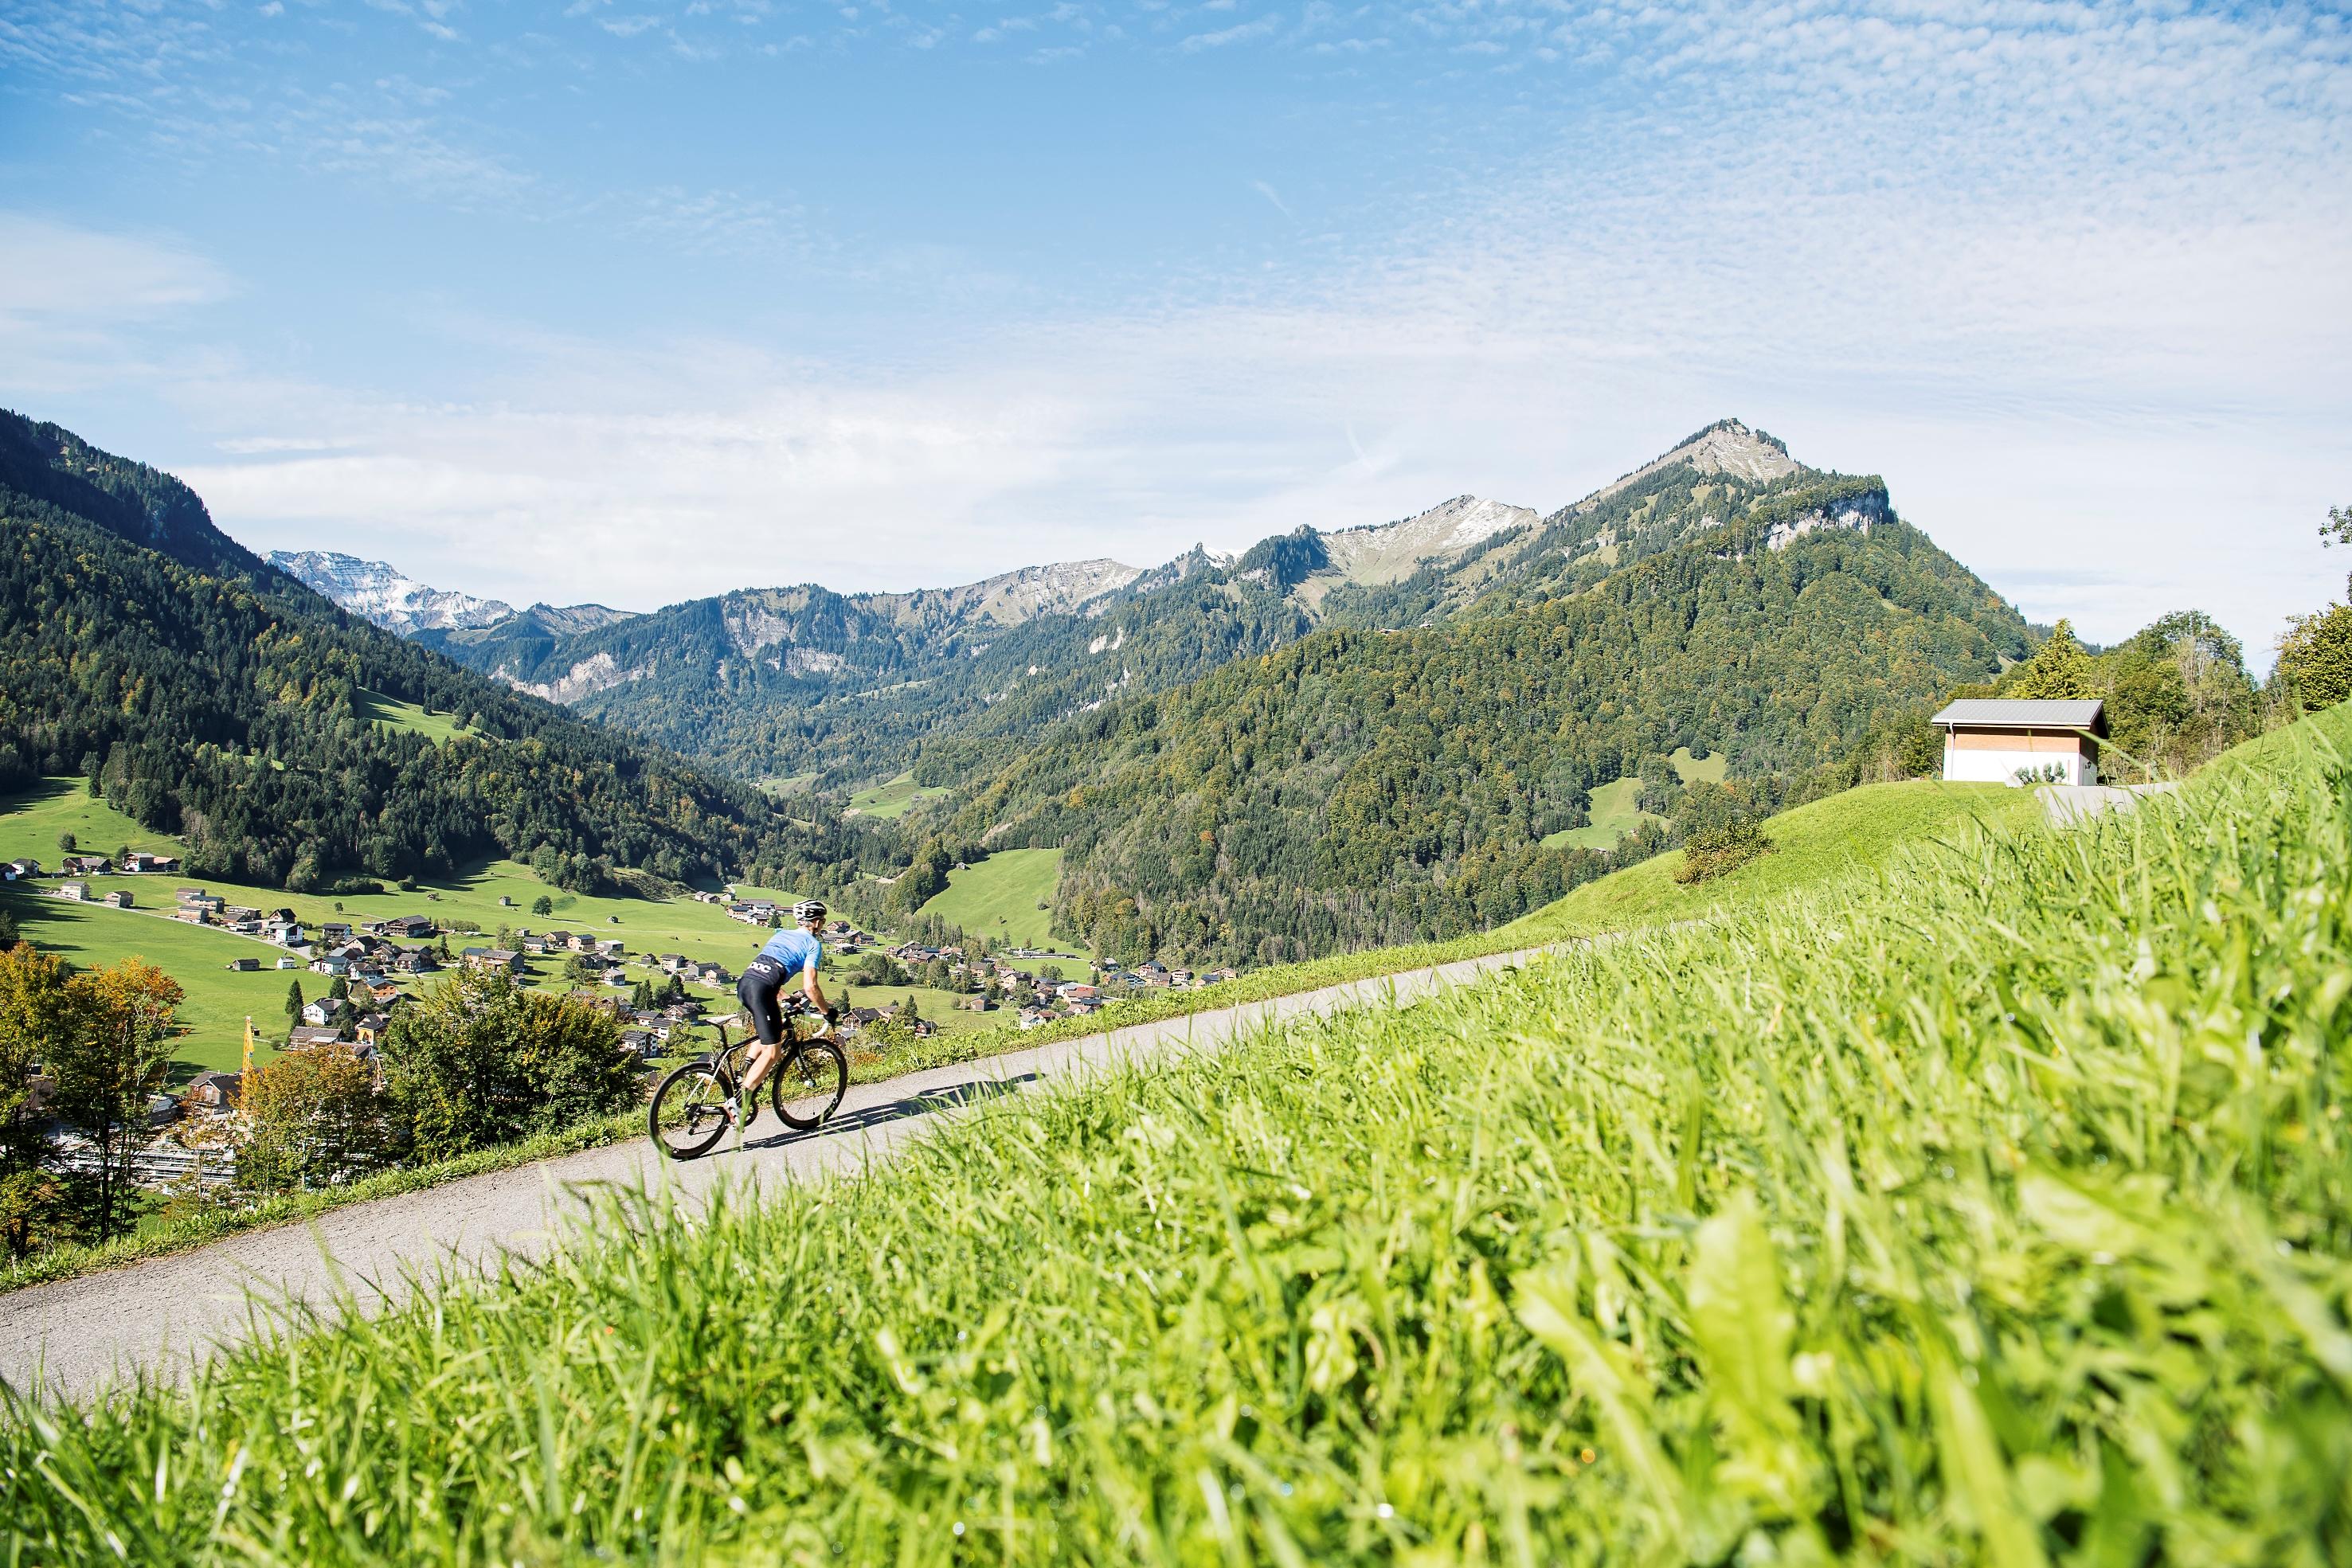 Rennrad fahren in Mellau